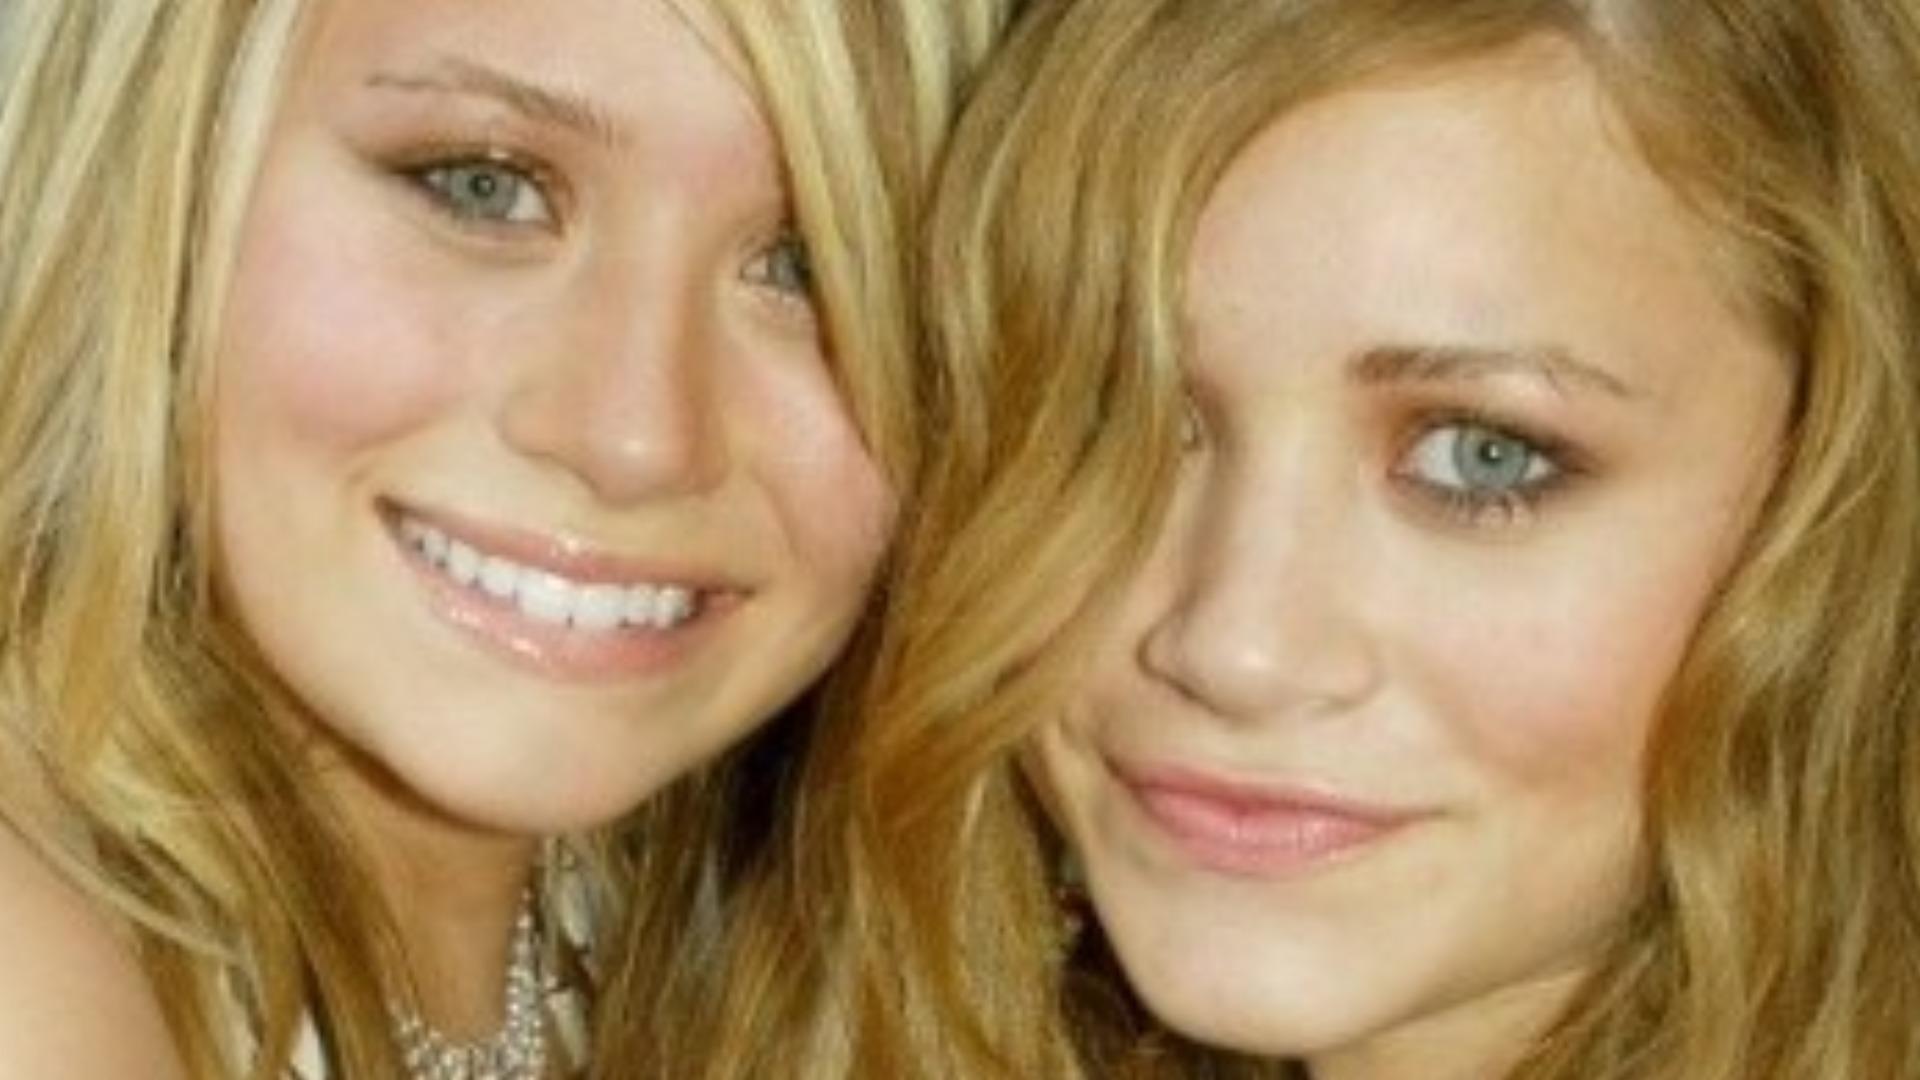 Tragic Details About The Olsen Twins